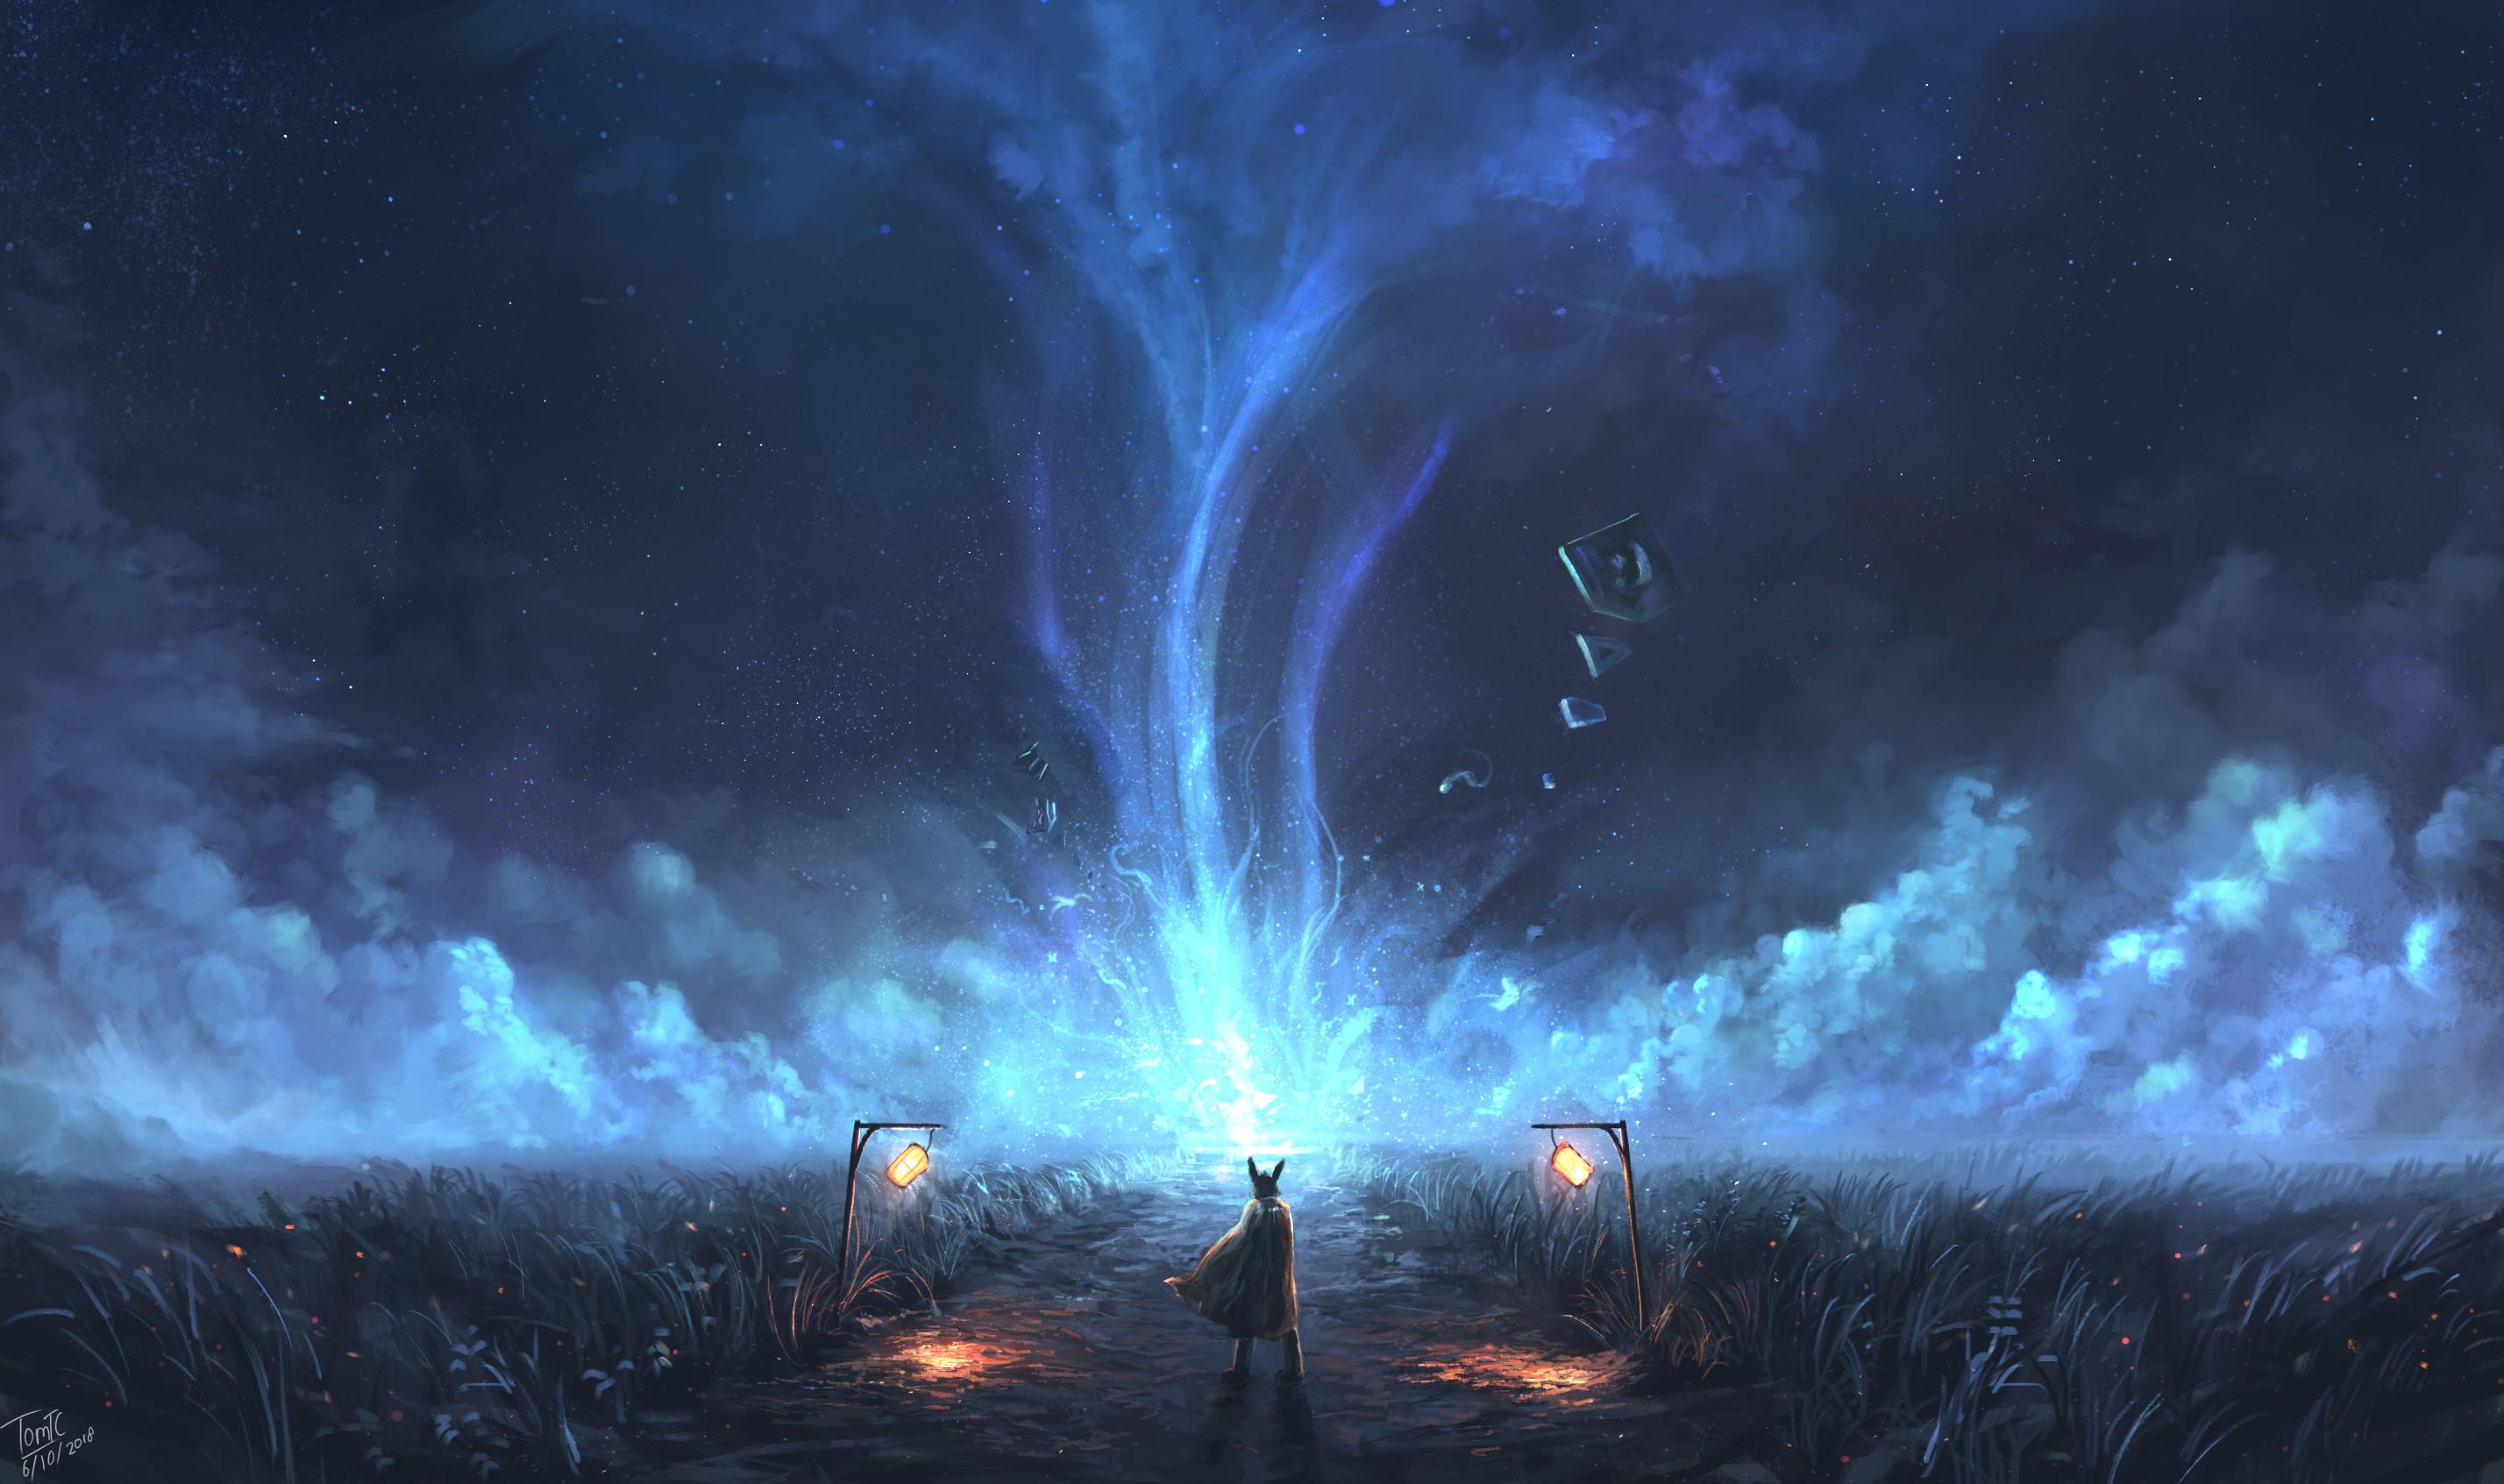 2560x1080 Final Fantasy Xv Artwork 2560x1080 Resolution Hd: 2560x1080 Warrior Bright Night Starscapes Digital Art